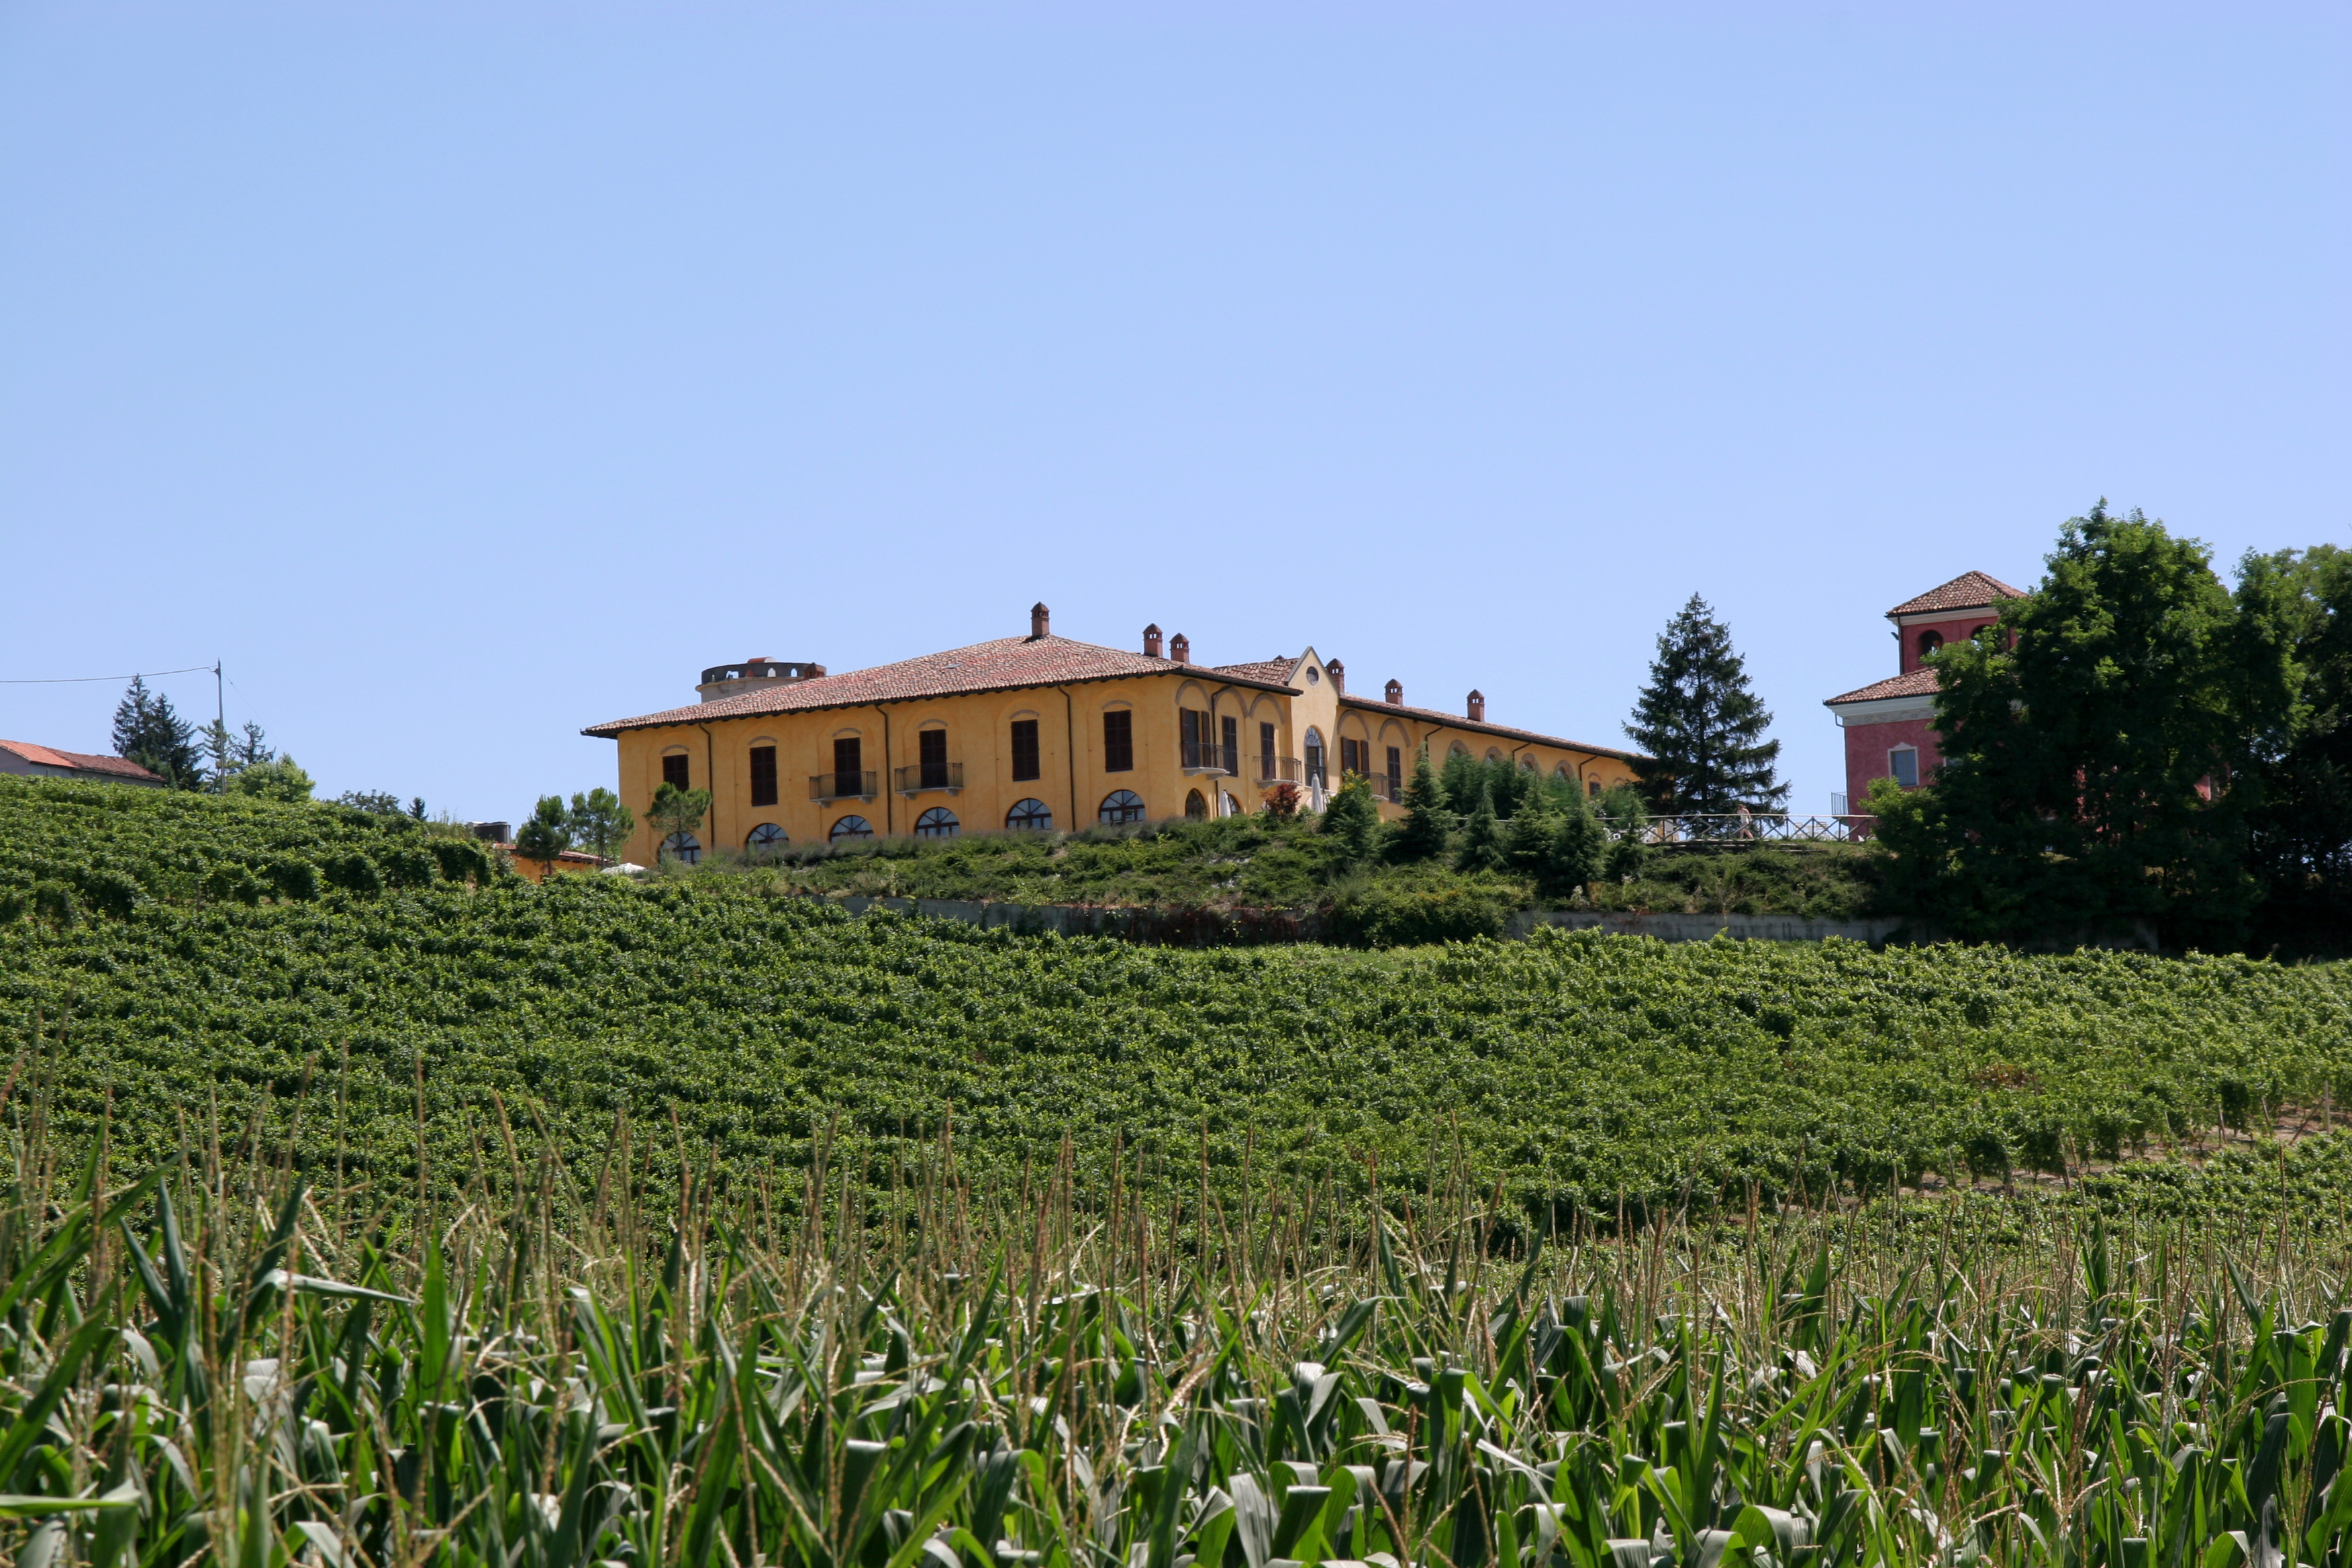 Tenuta la romana monferrato bookingable - Piscina nizza monferrato ...